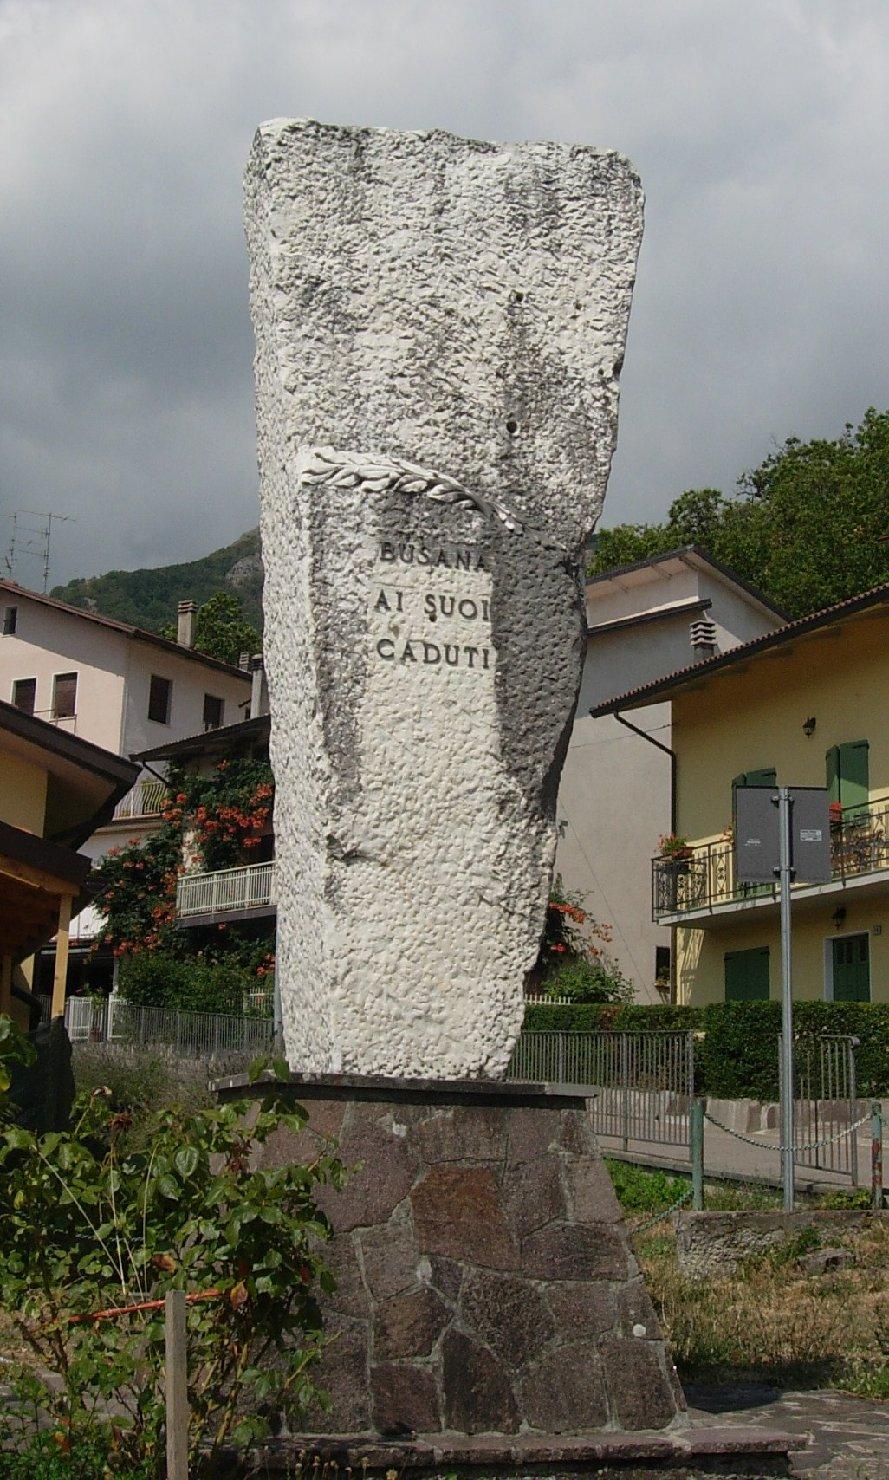 monumento ai caduti - a montagna figurata - bottega Italia settentrionale (sec. XX)